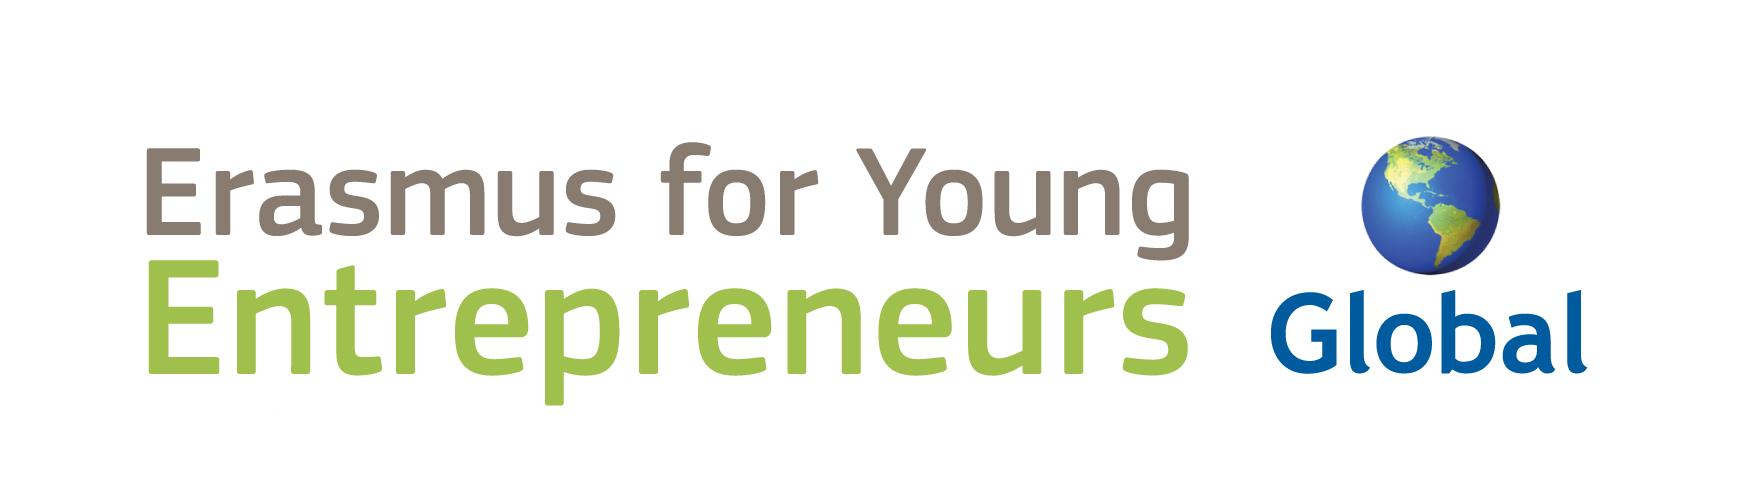 Erasmus for Young Entrepreneurs (EYE) Global